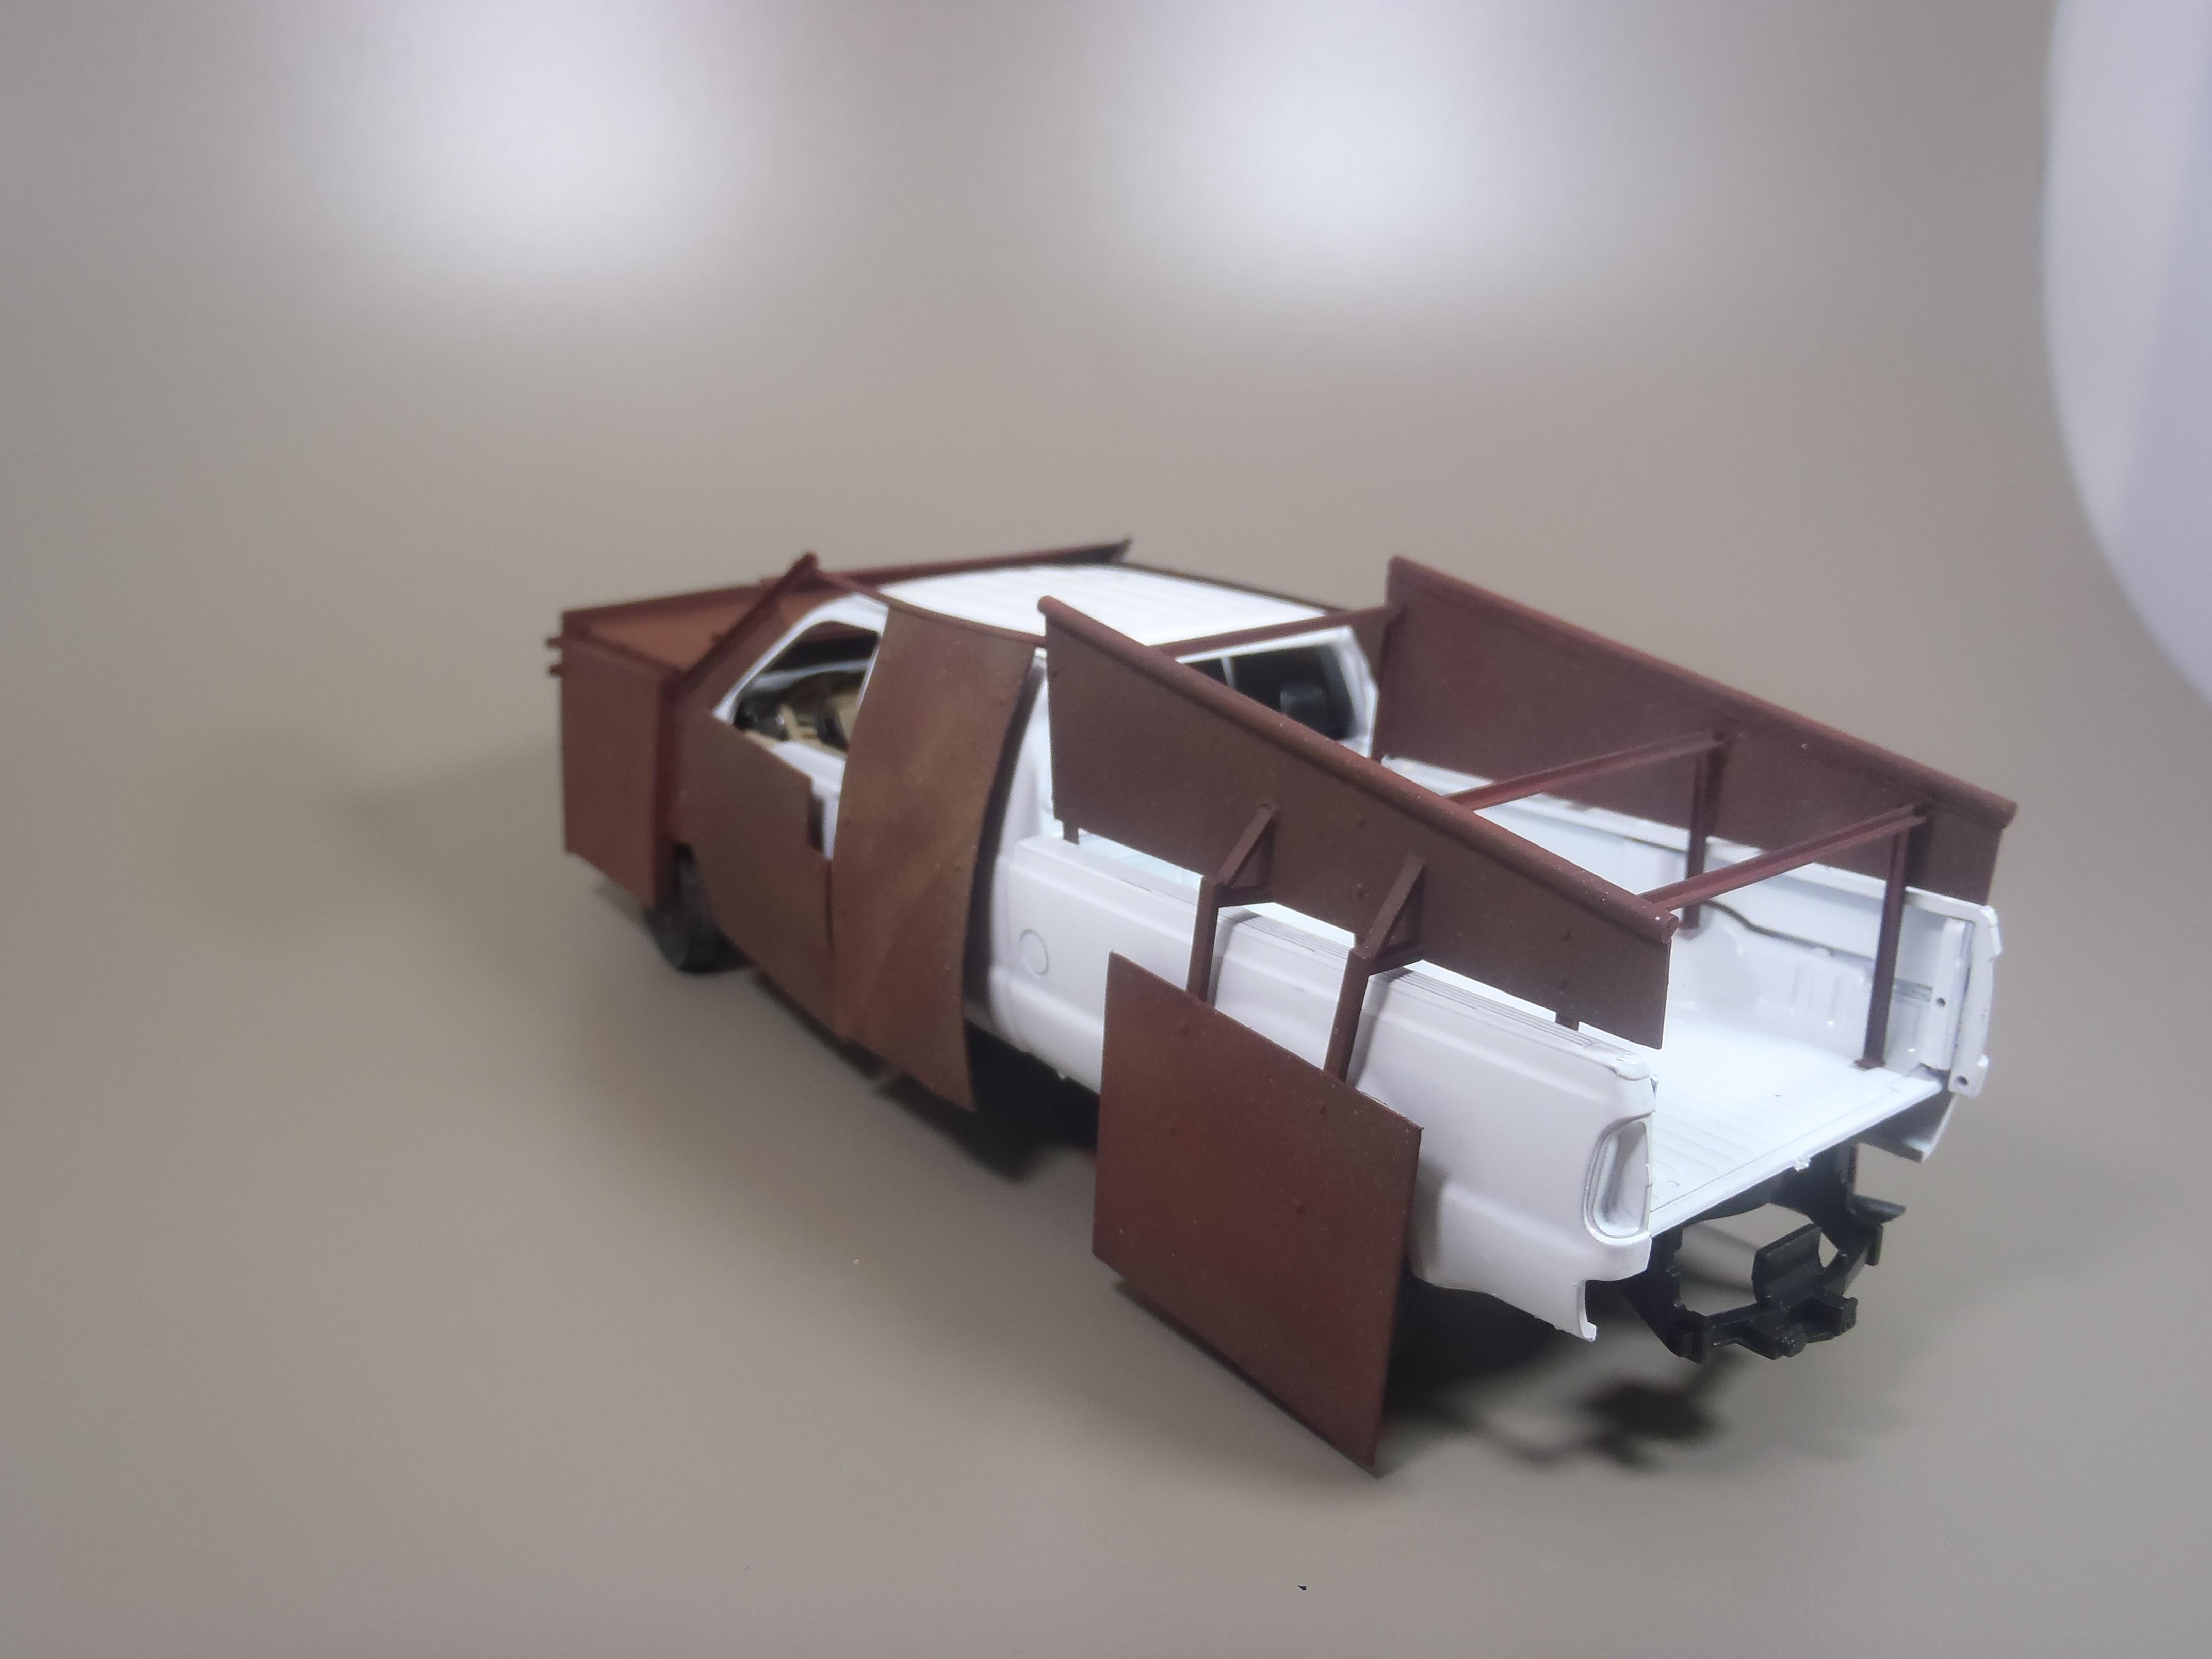 Pickup F 350 (Meng) au 1/35 - Page 2 16111509541015742614639666